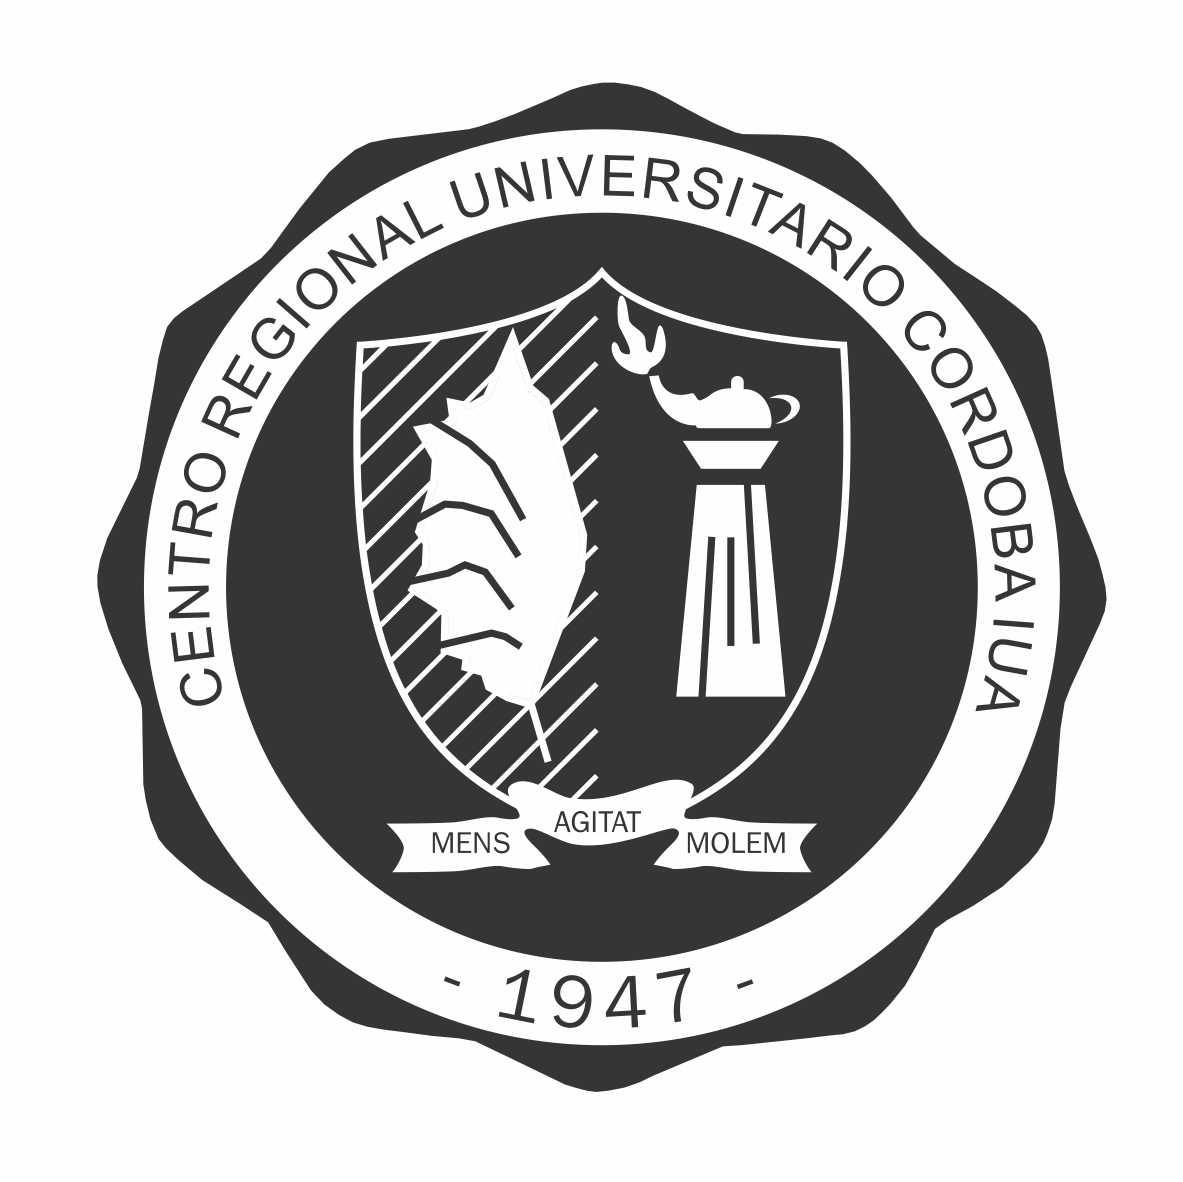 logo CRUCIUA_ByN